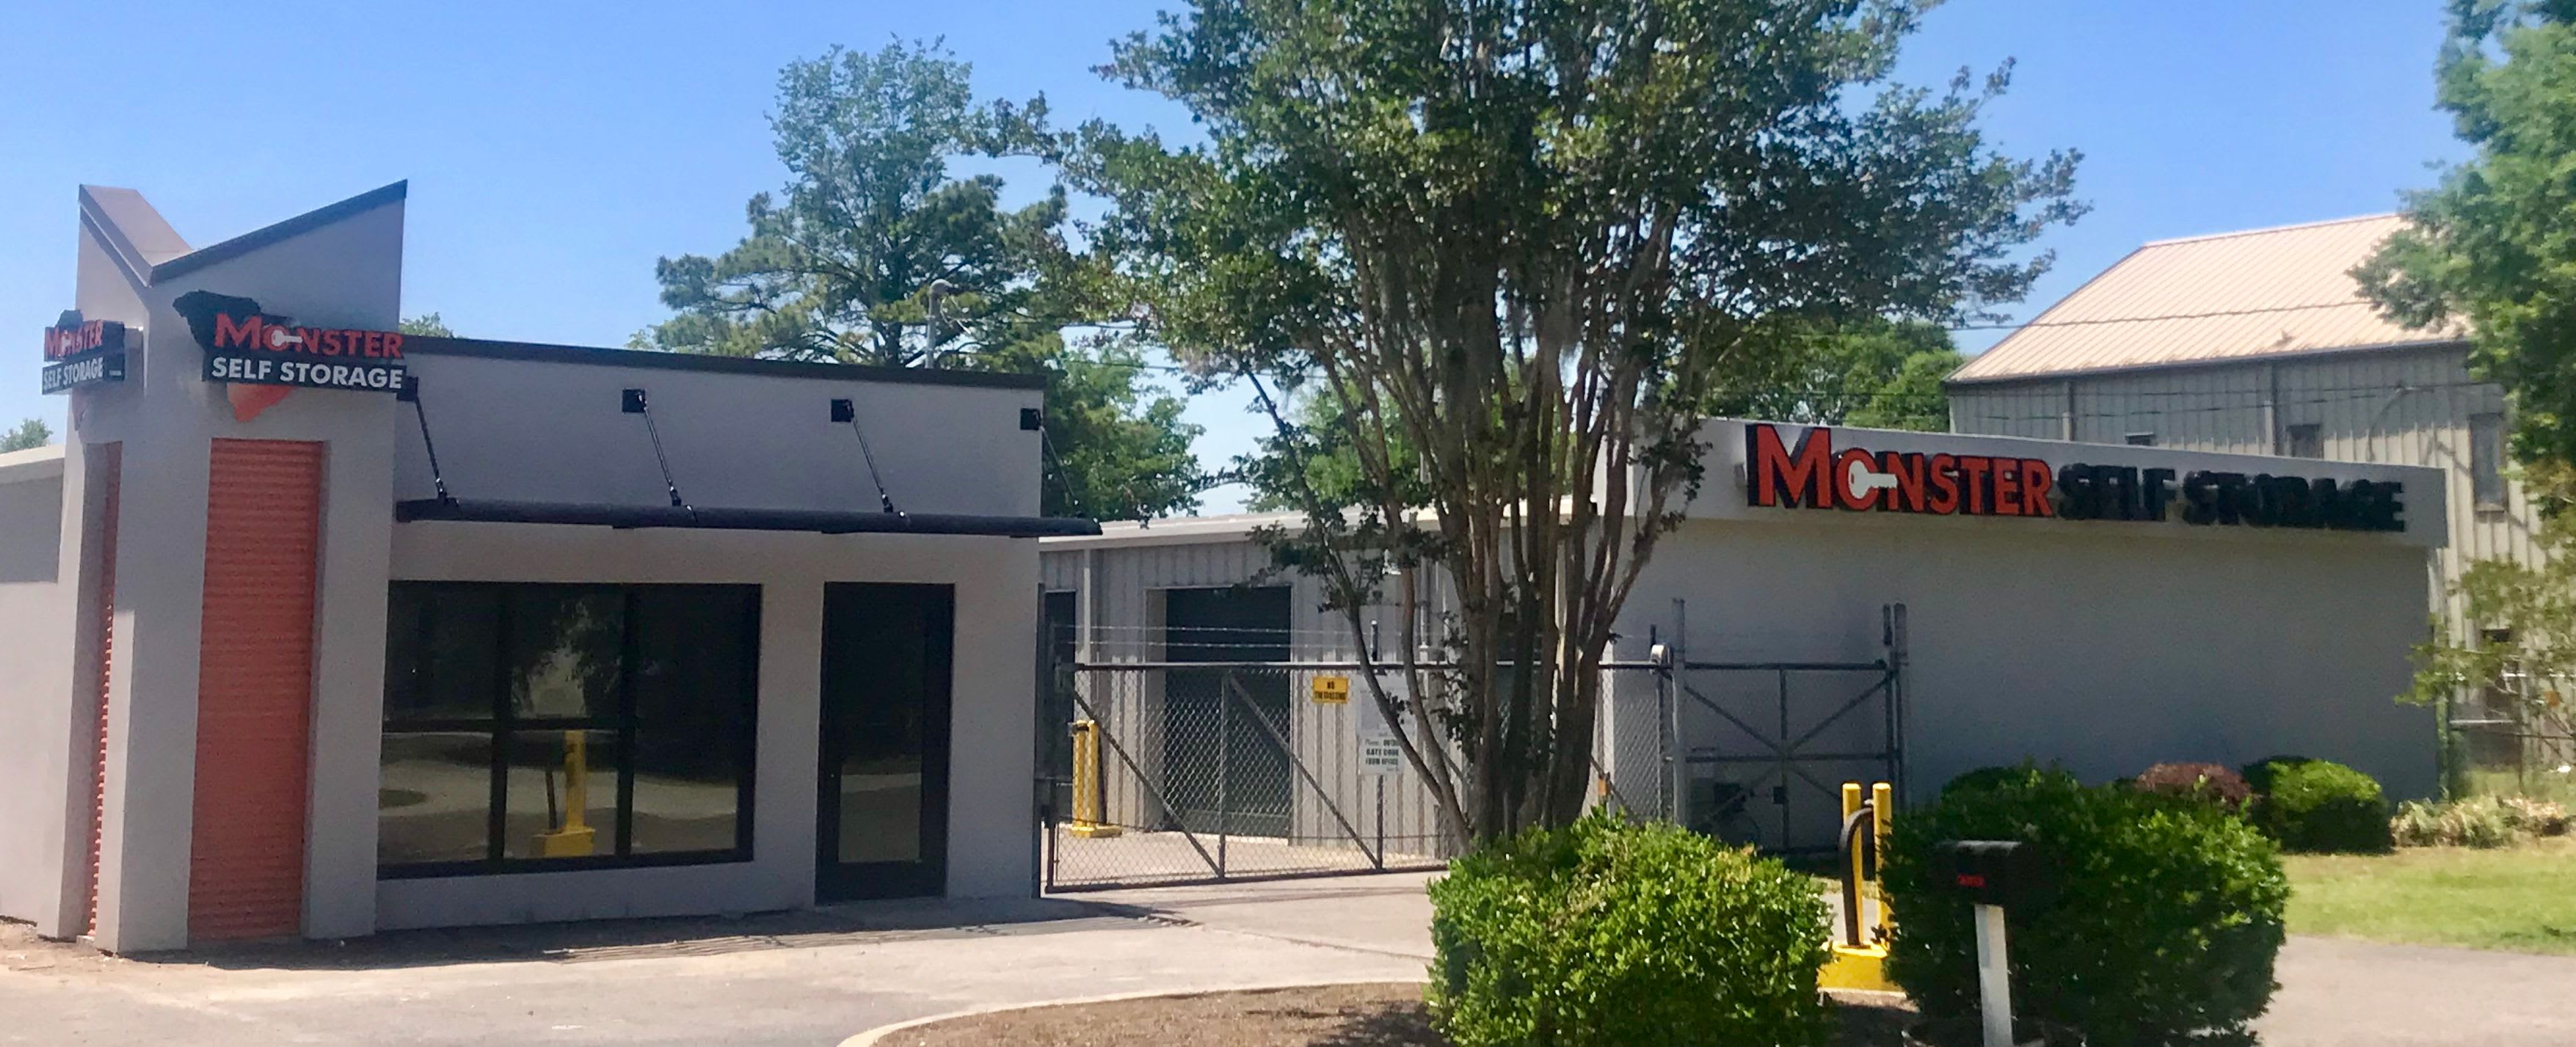 Self storage at Monster Self Storage in Orangeburg, South Carolina